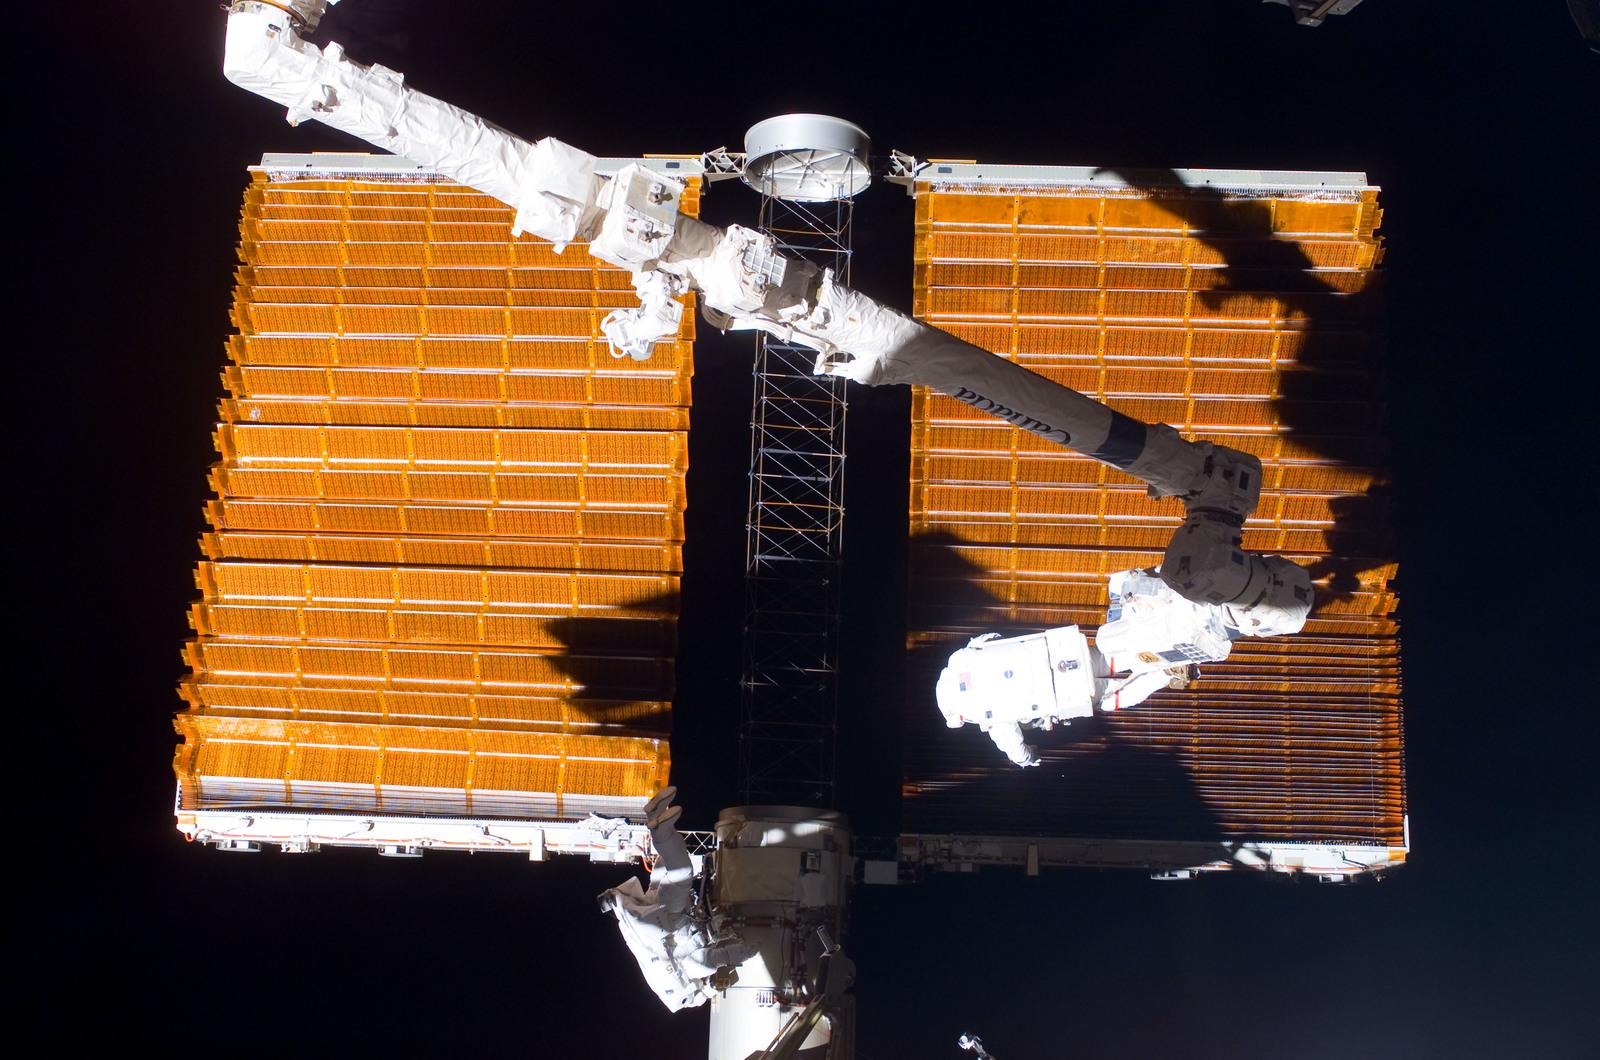 S116E06857 - STS-116 - STS-116 MS Fuglesang and Curbeam,Jr.,during EVA 4